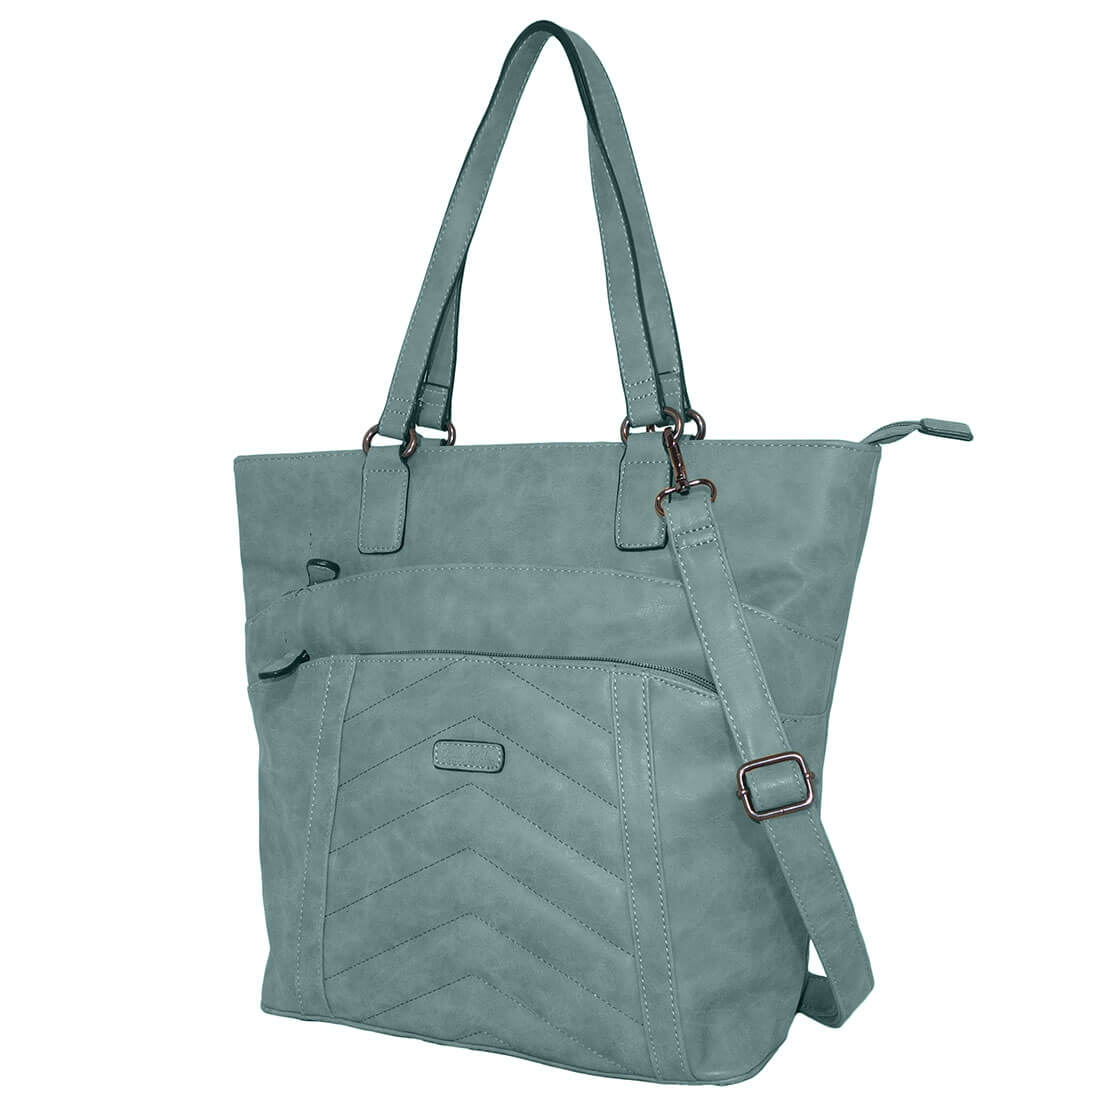 Piace Molto Shopper / Schoudertas Lisa Turquoise-0